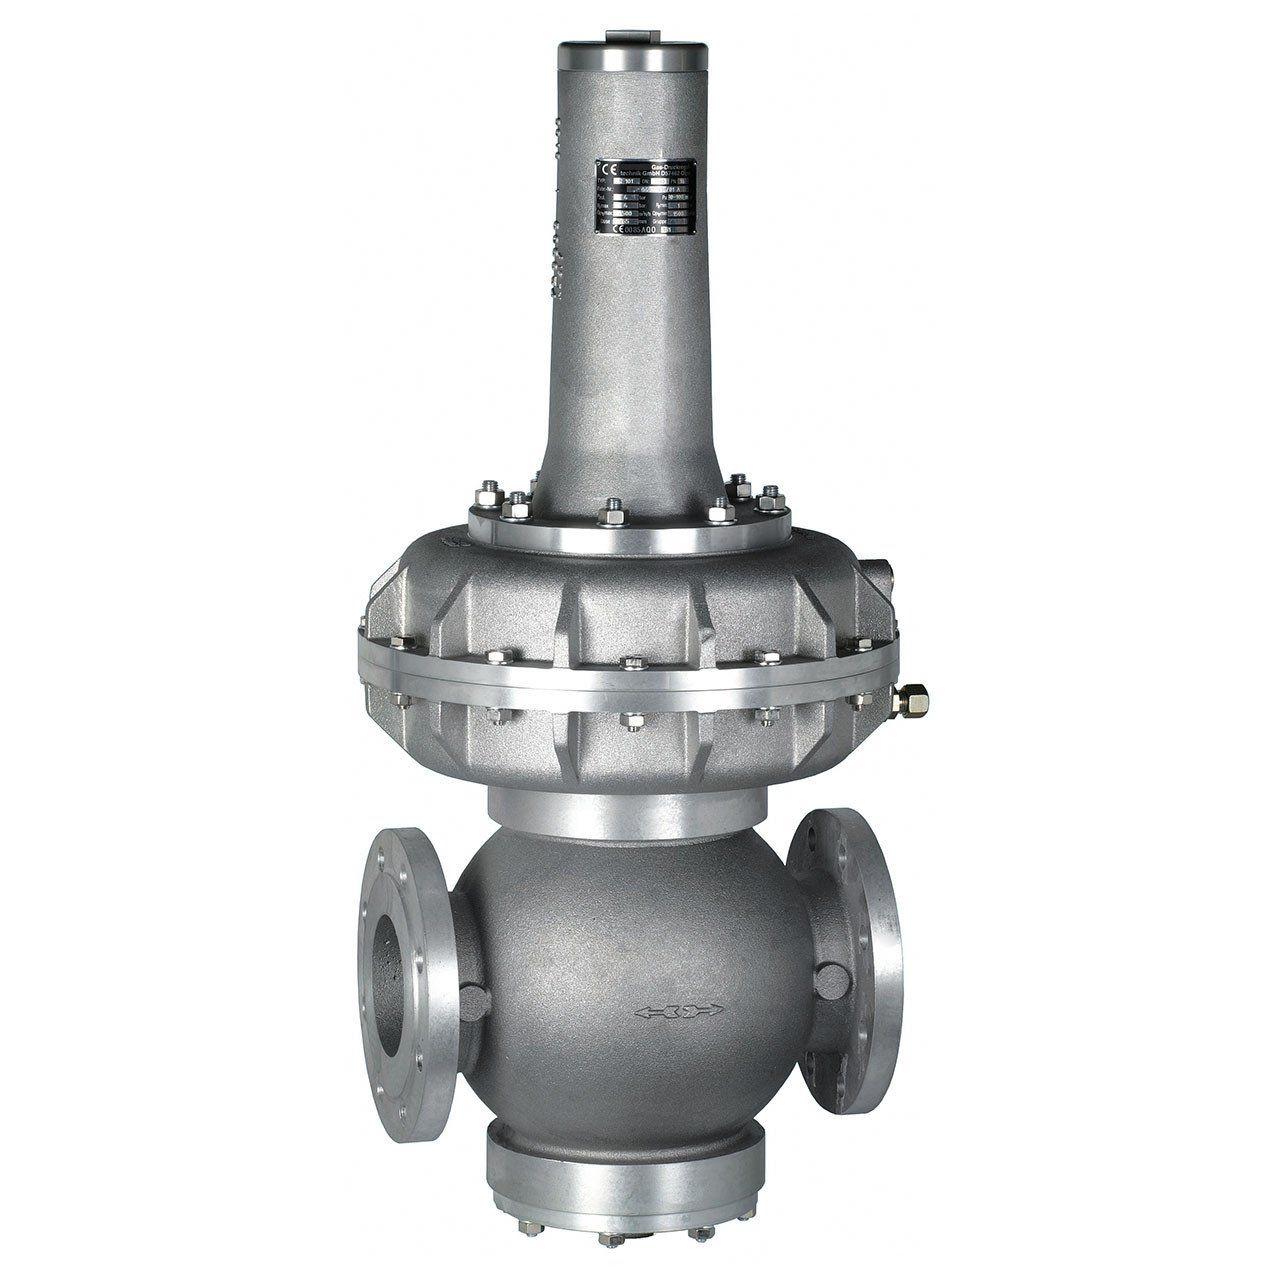 Medenus R101 Gas Pressure Regulator (With images) Gas